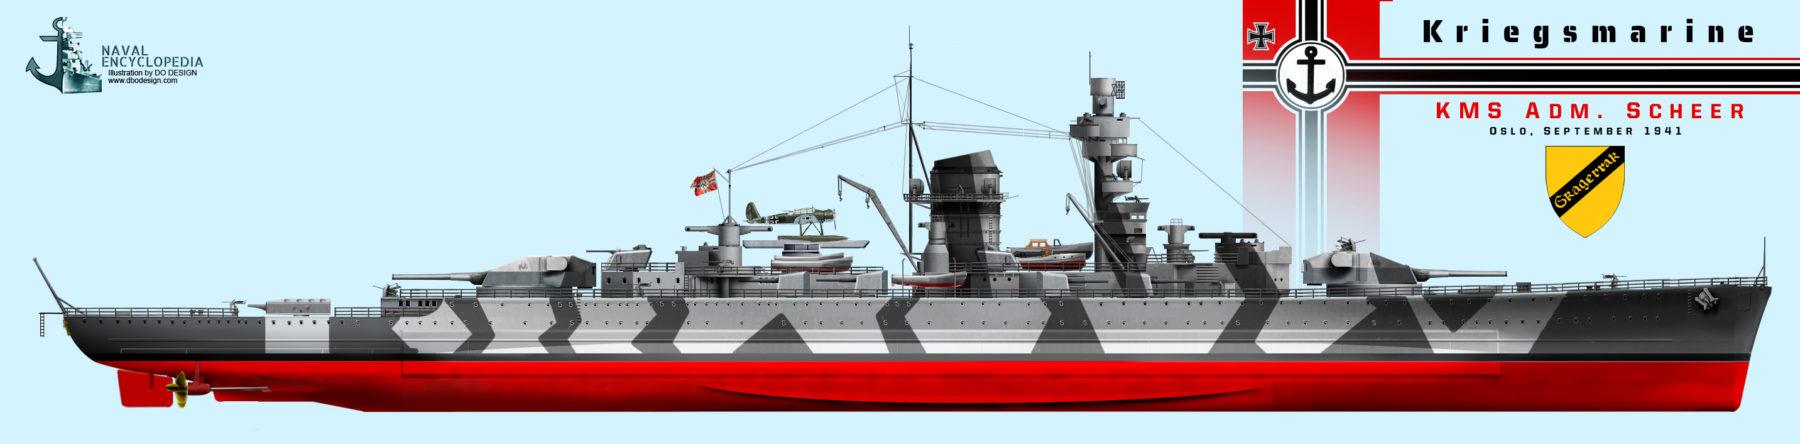 KMS Admiral Scheer, Oslo September 1941